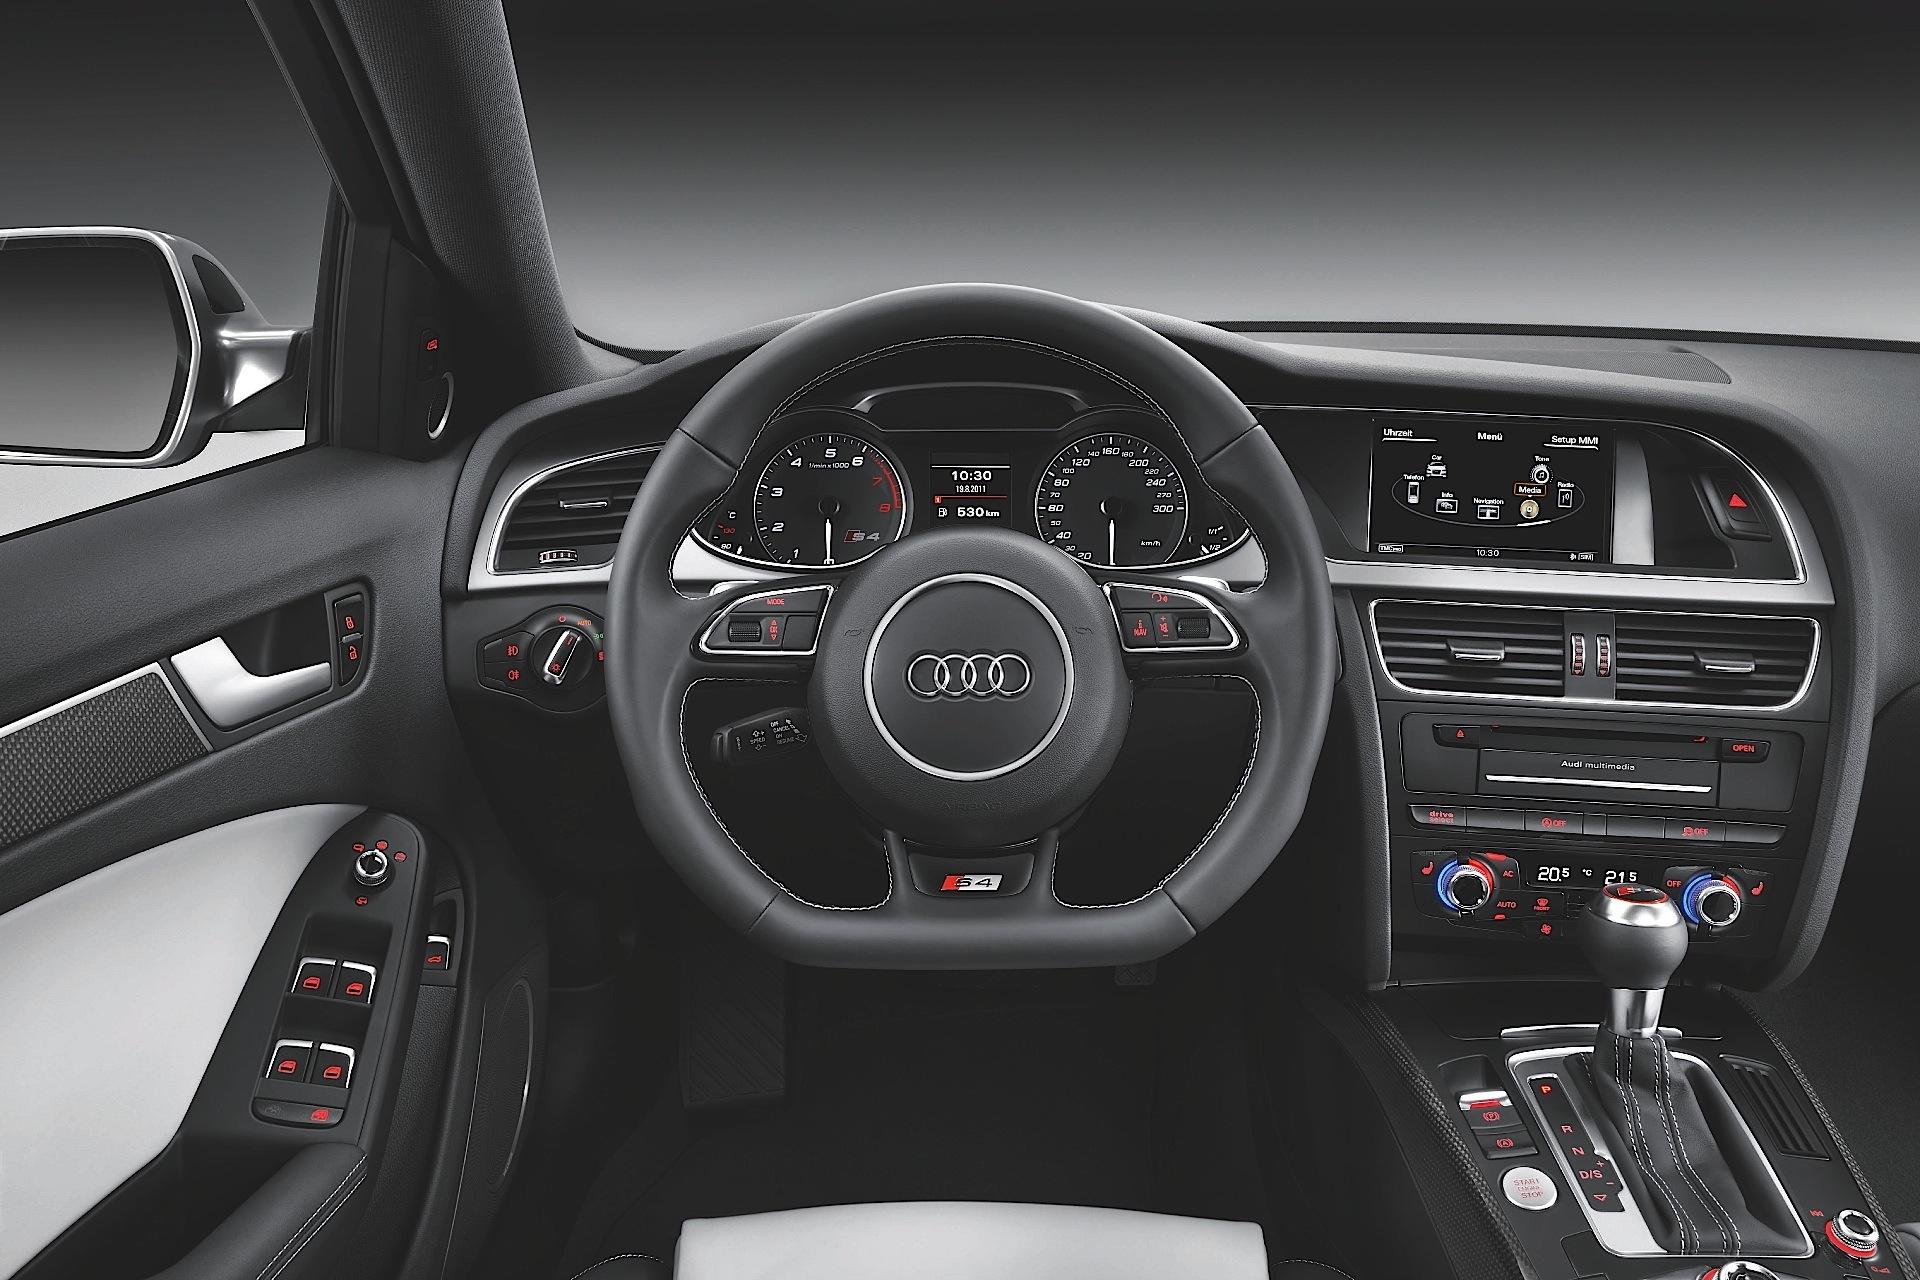 audi s4 specs 2008 2009 2010 2011 2012 autoevolution rh autoevolution com 12 Audi S4 2009 Audi S4